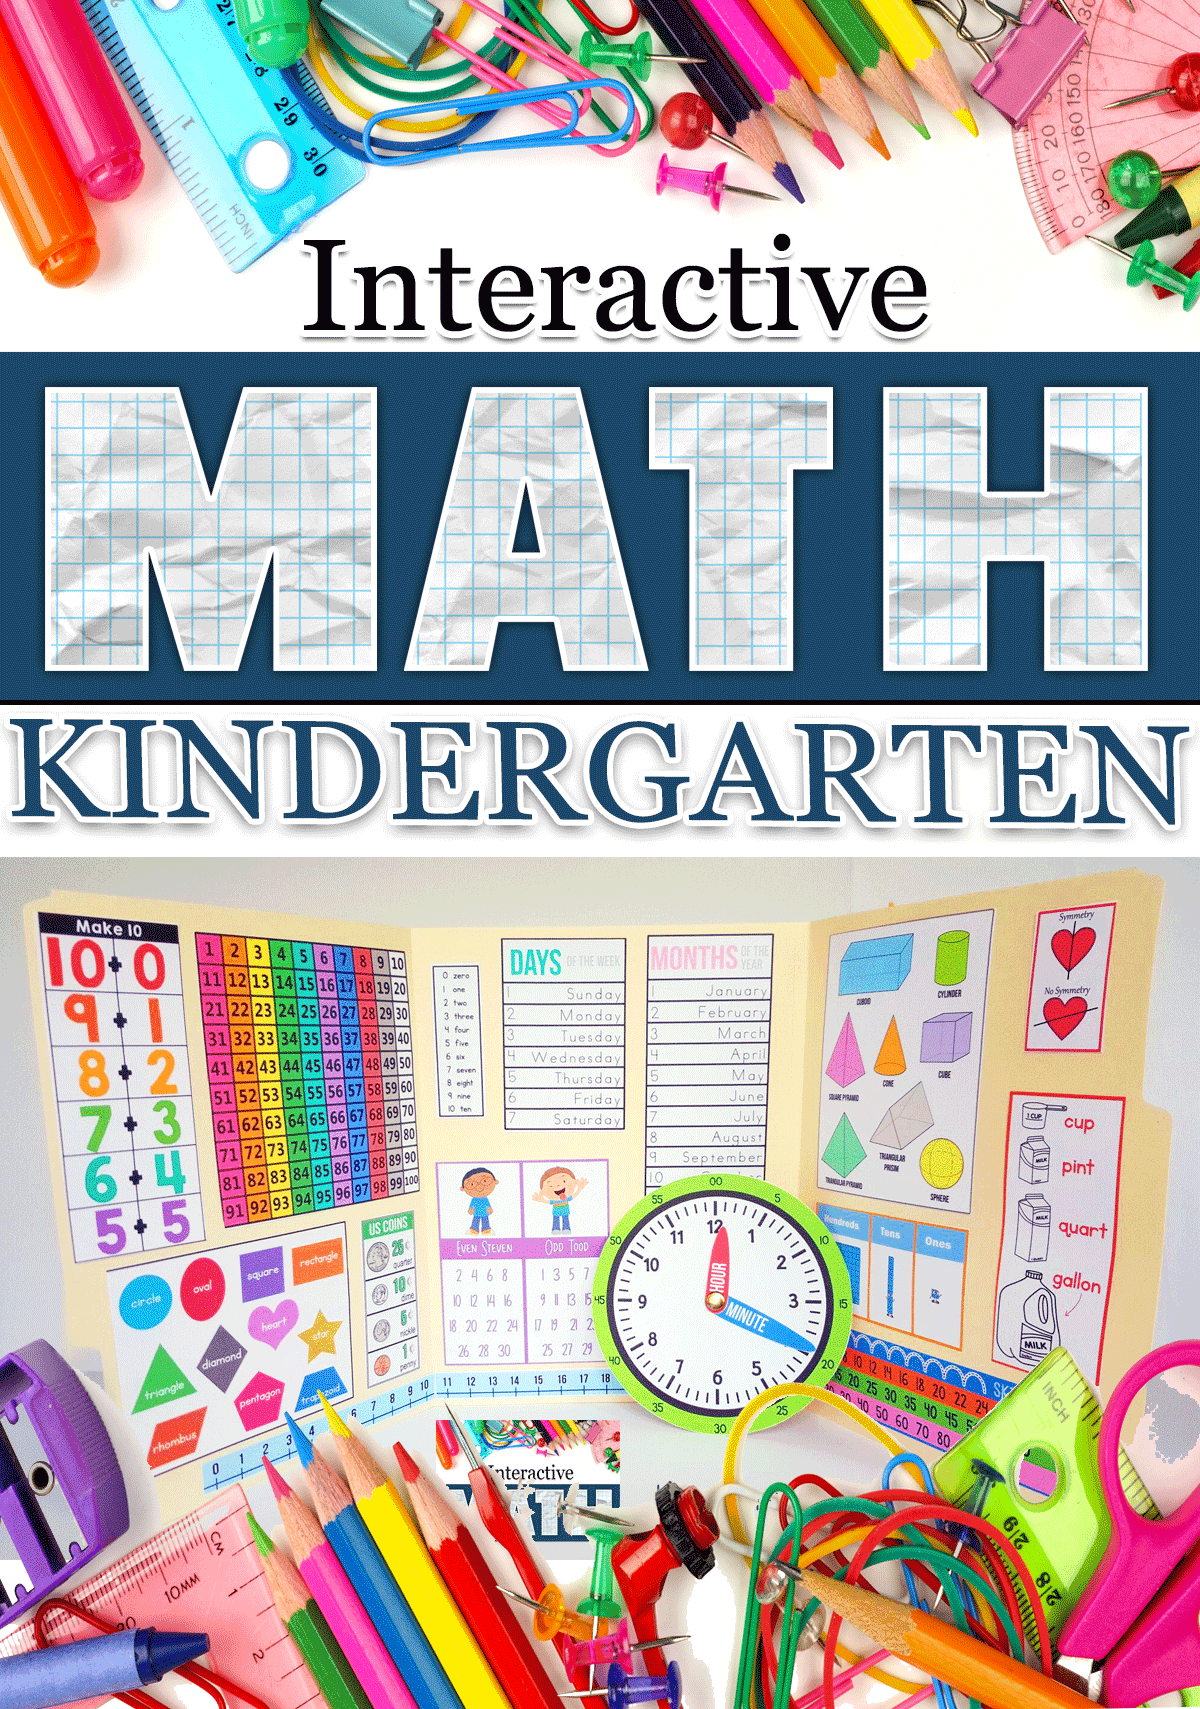 Interactive Math Notebook for Kindergarten - The Crafty Classroom